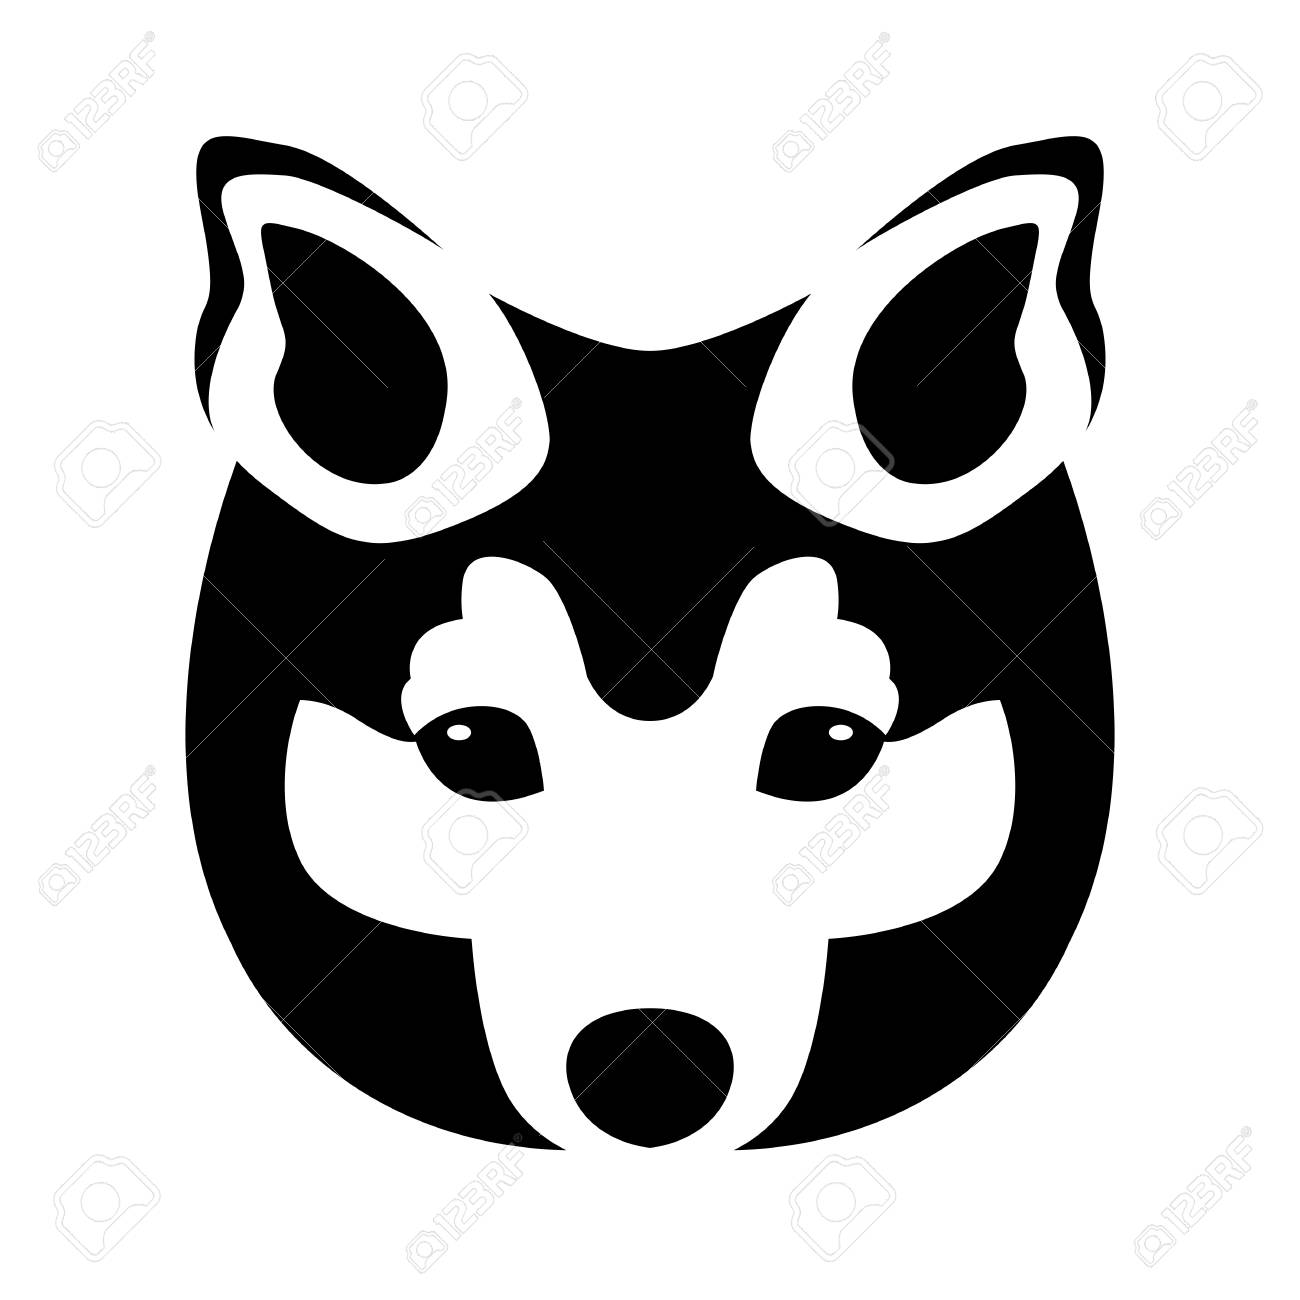 Dog Face Vector Illustration Black Silhouette Front Side